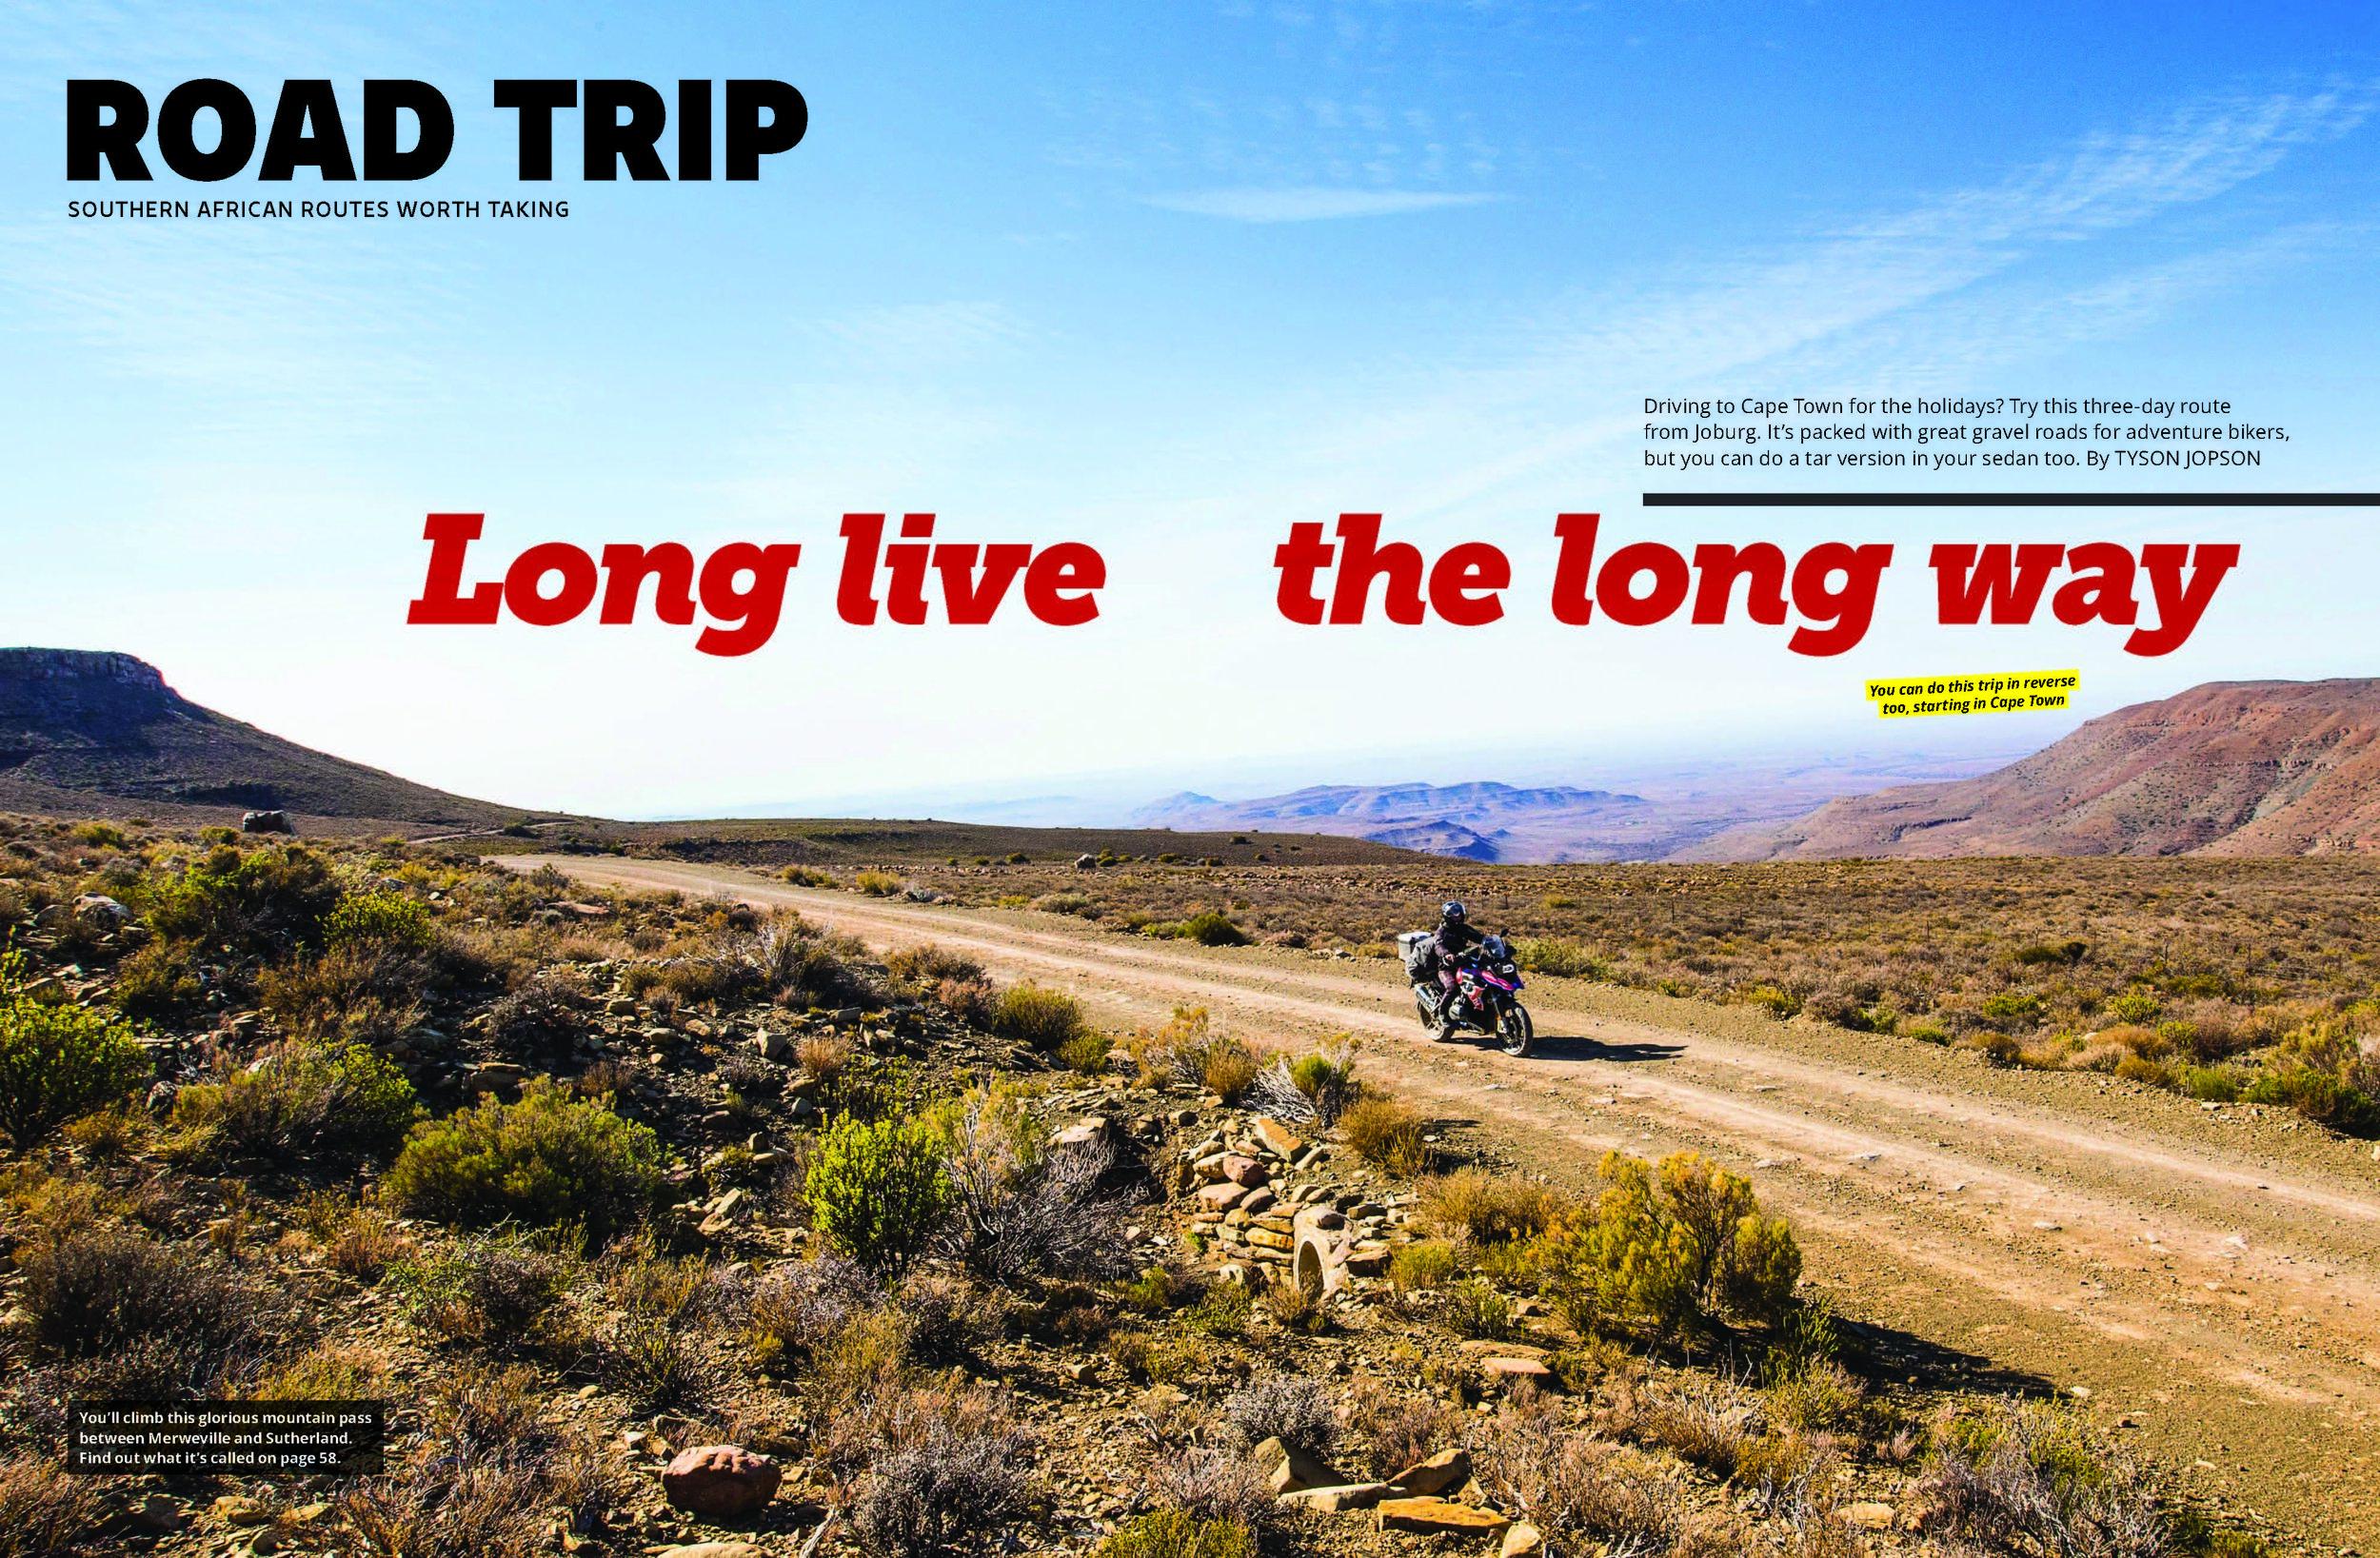 Getaway_Joburg_to_Cape_Town(nov-17)_Page_1.jpg